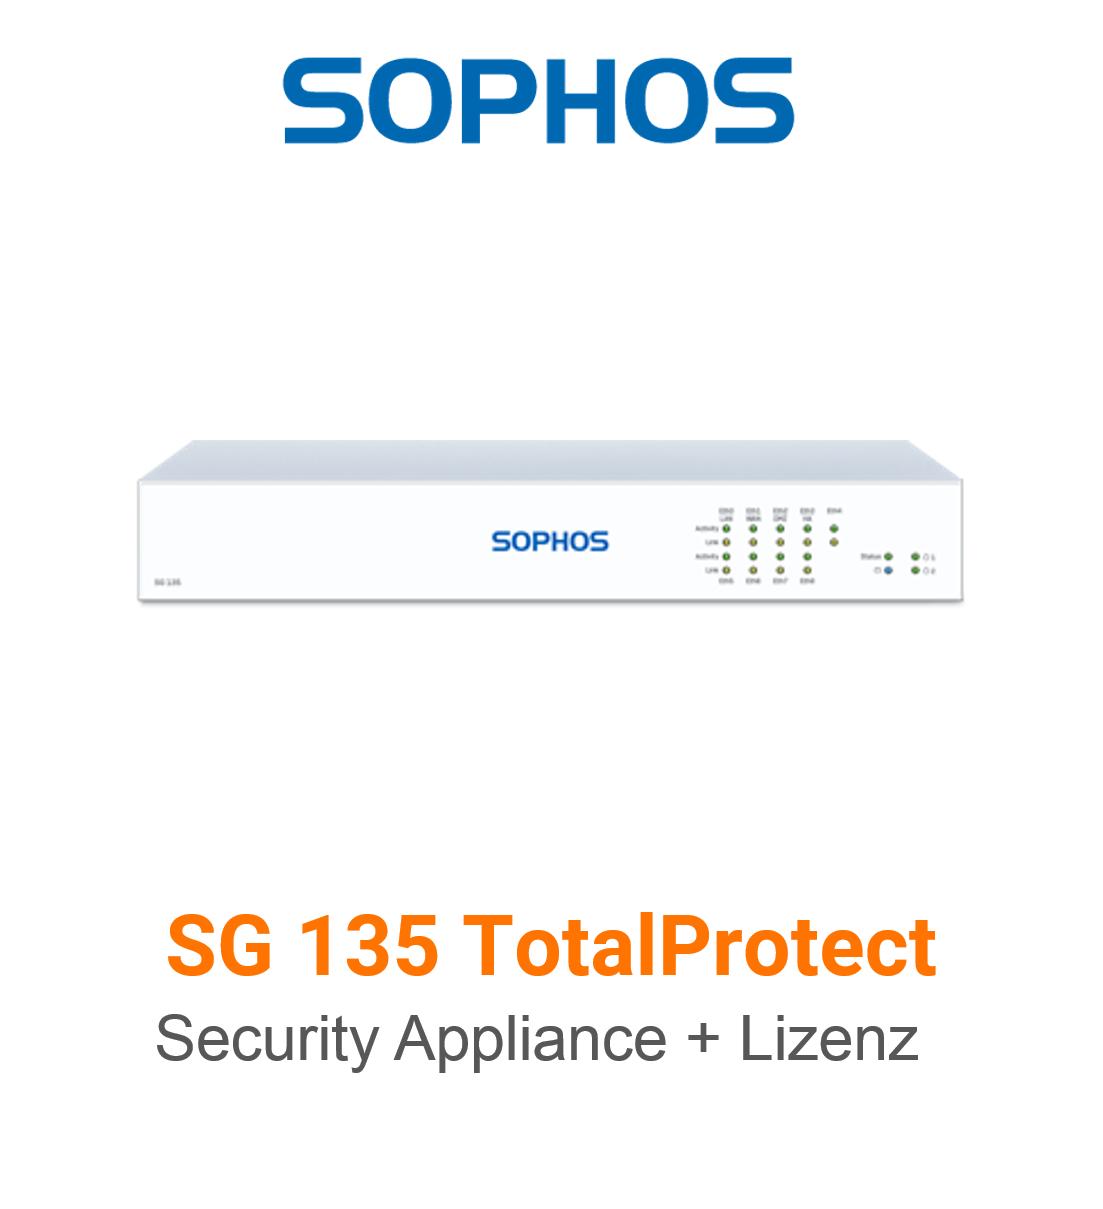 Sophos SG 135 TotalProtect Bundle (Hardware + Lizenz)